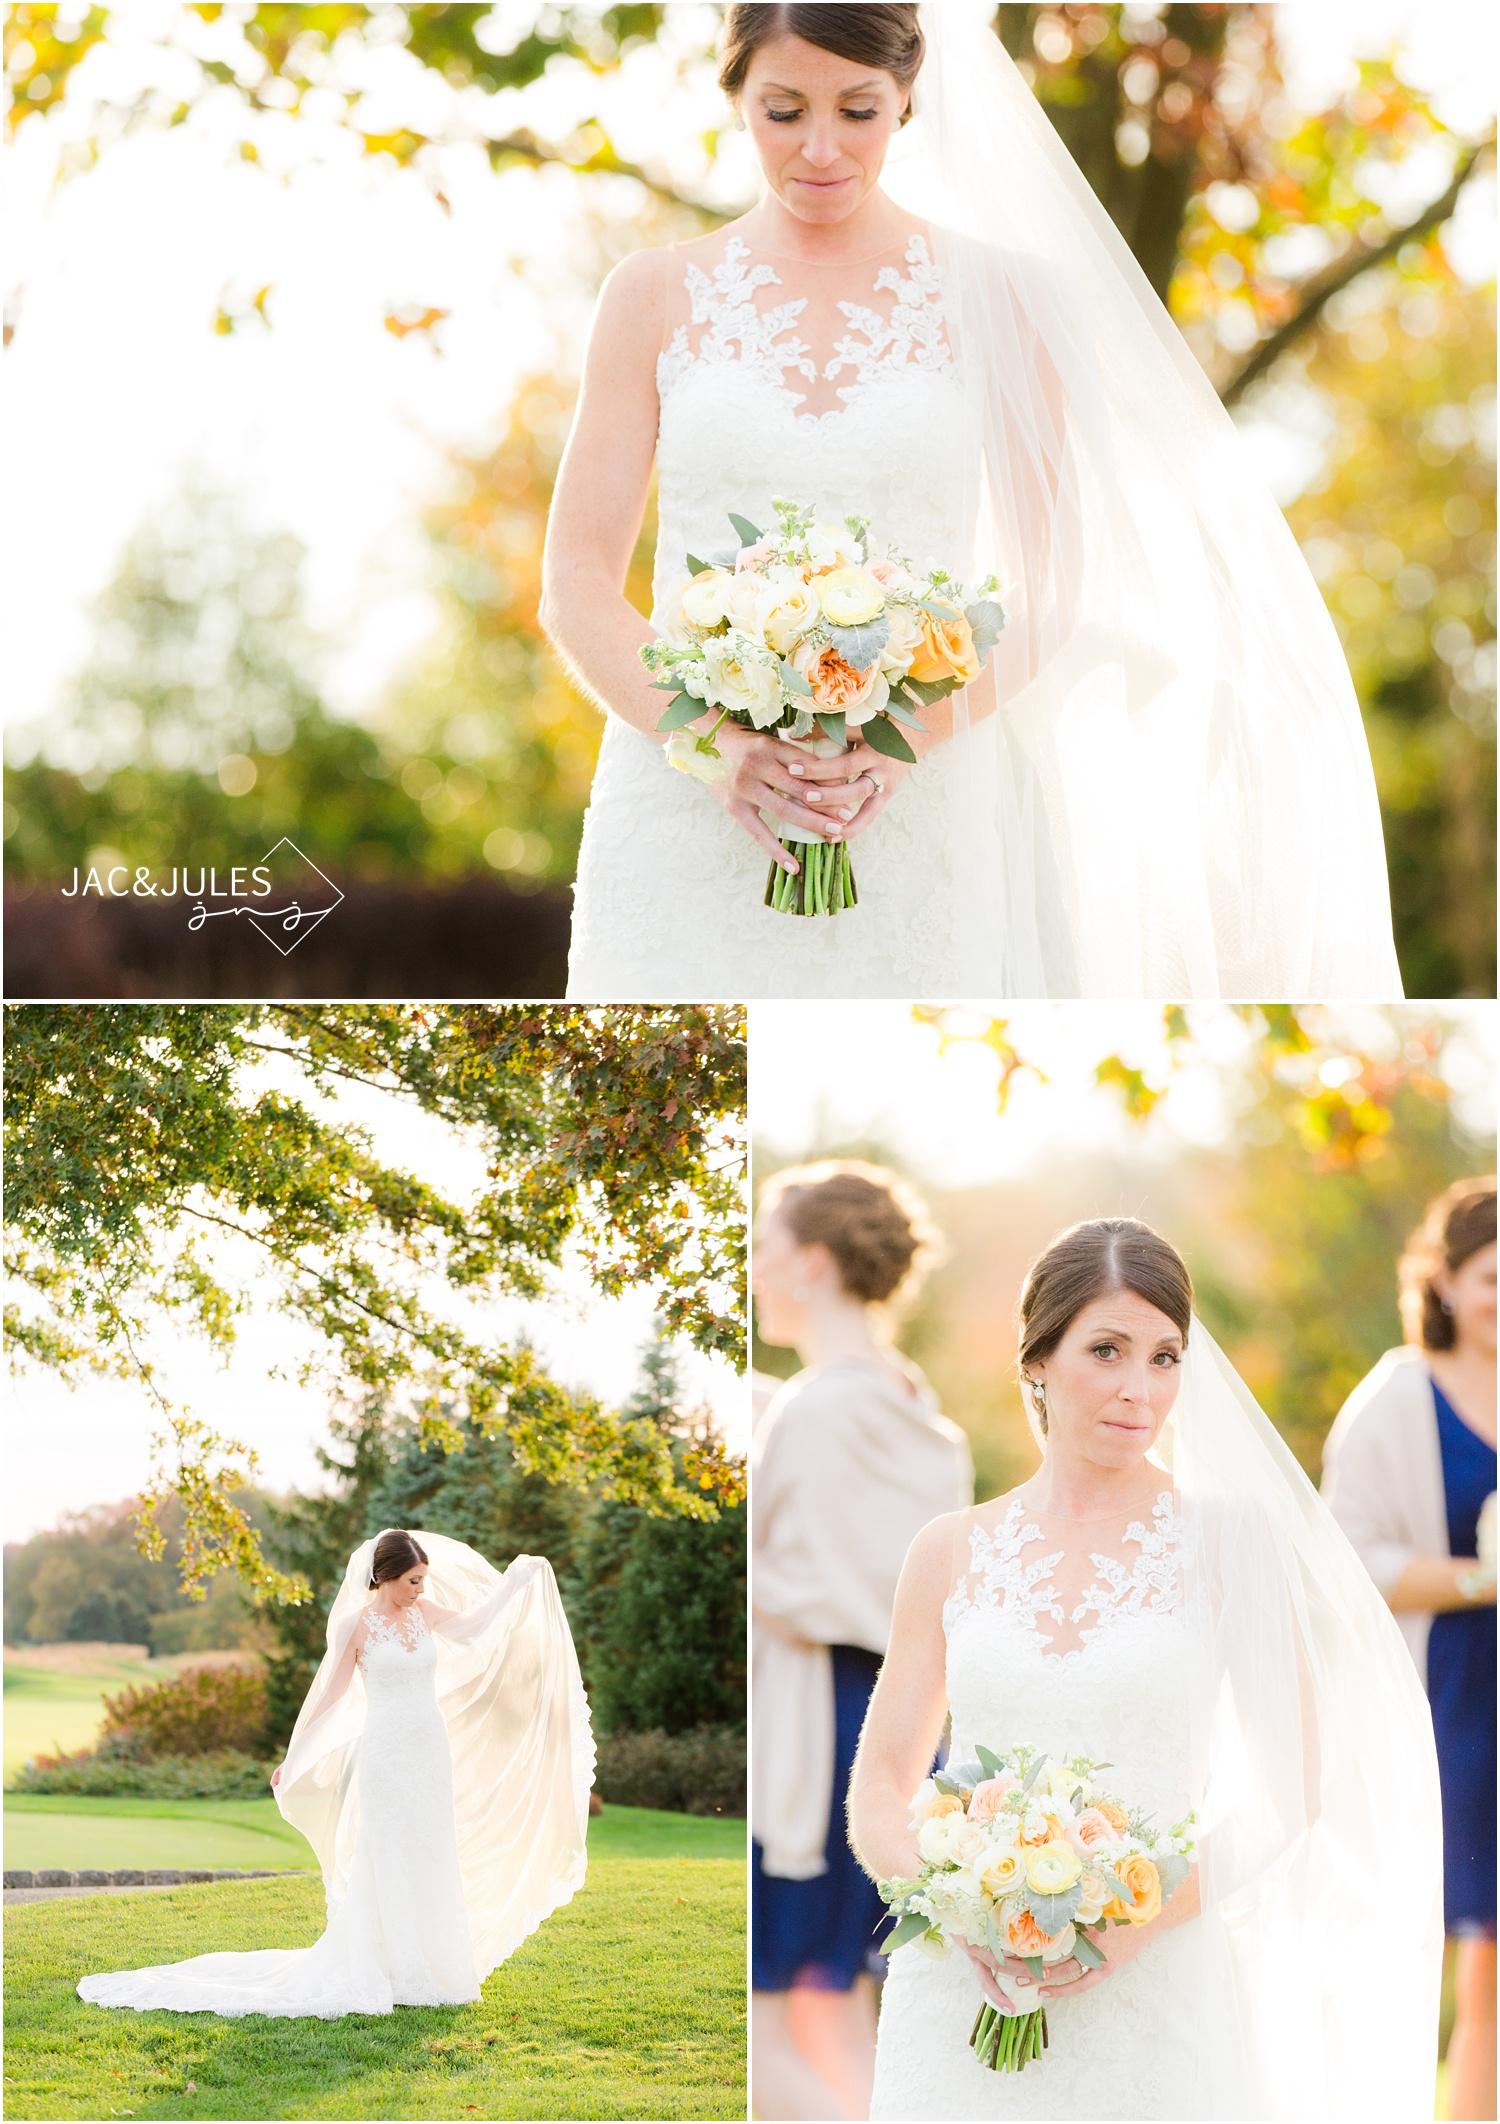 Bridal portraits at Eagle Oaks Golf and Country Club in Farmingdale, NJ.